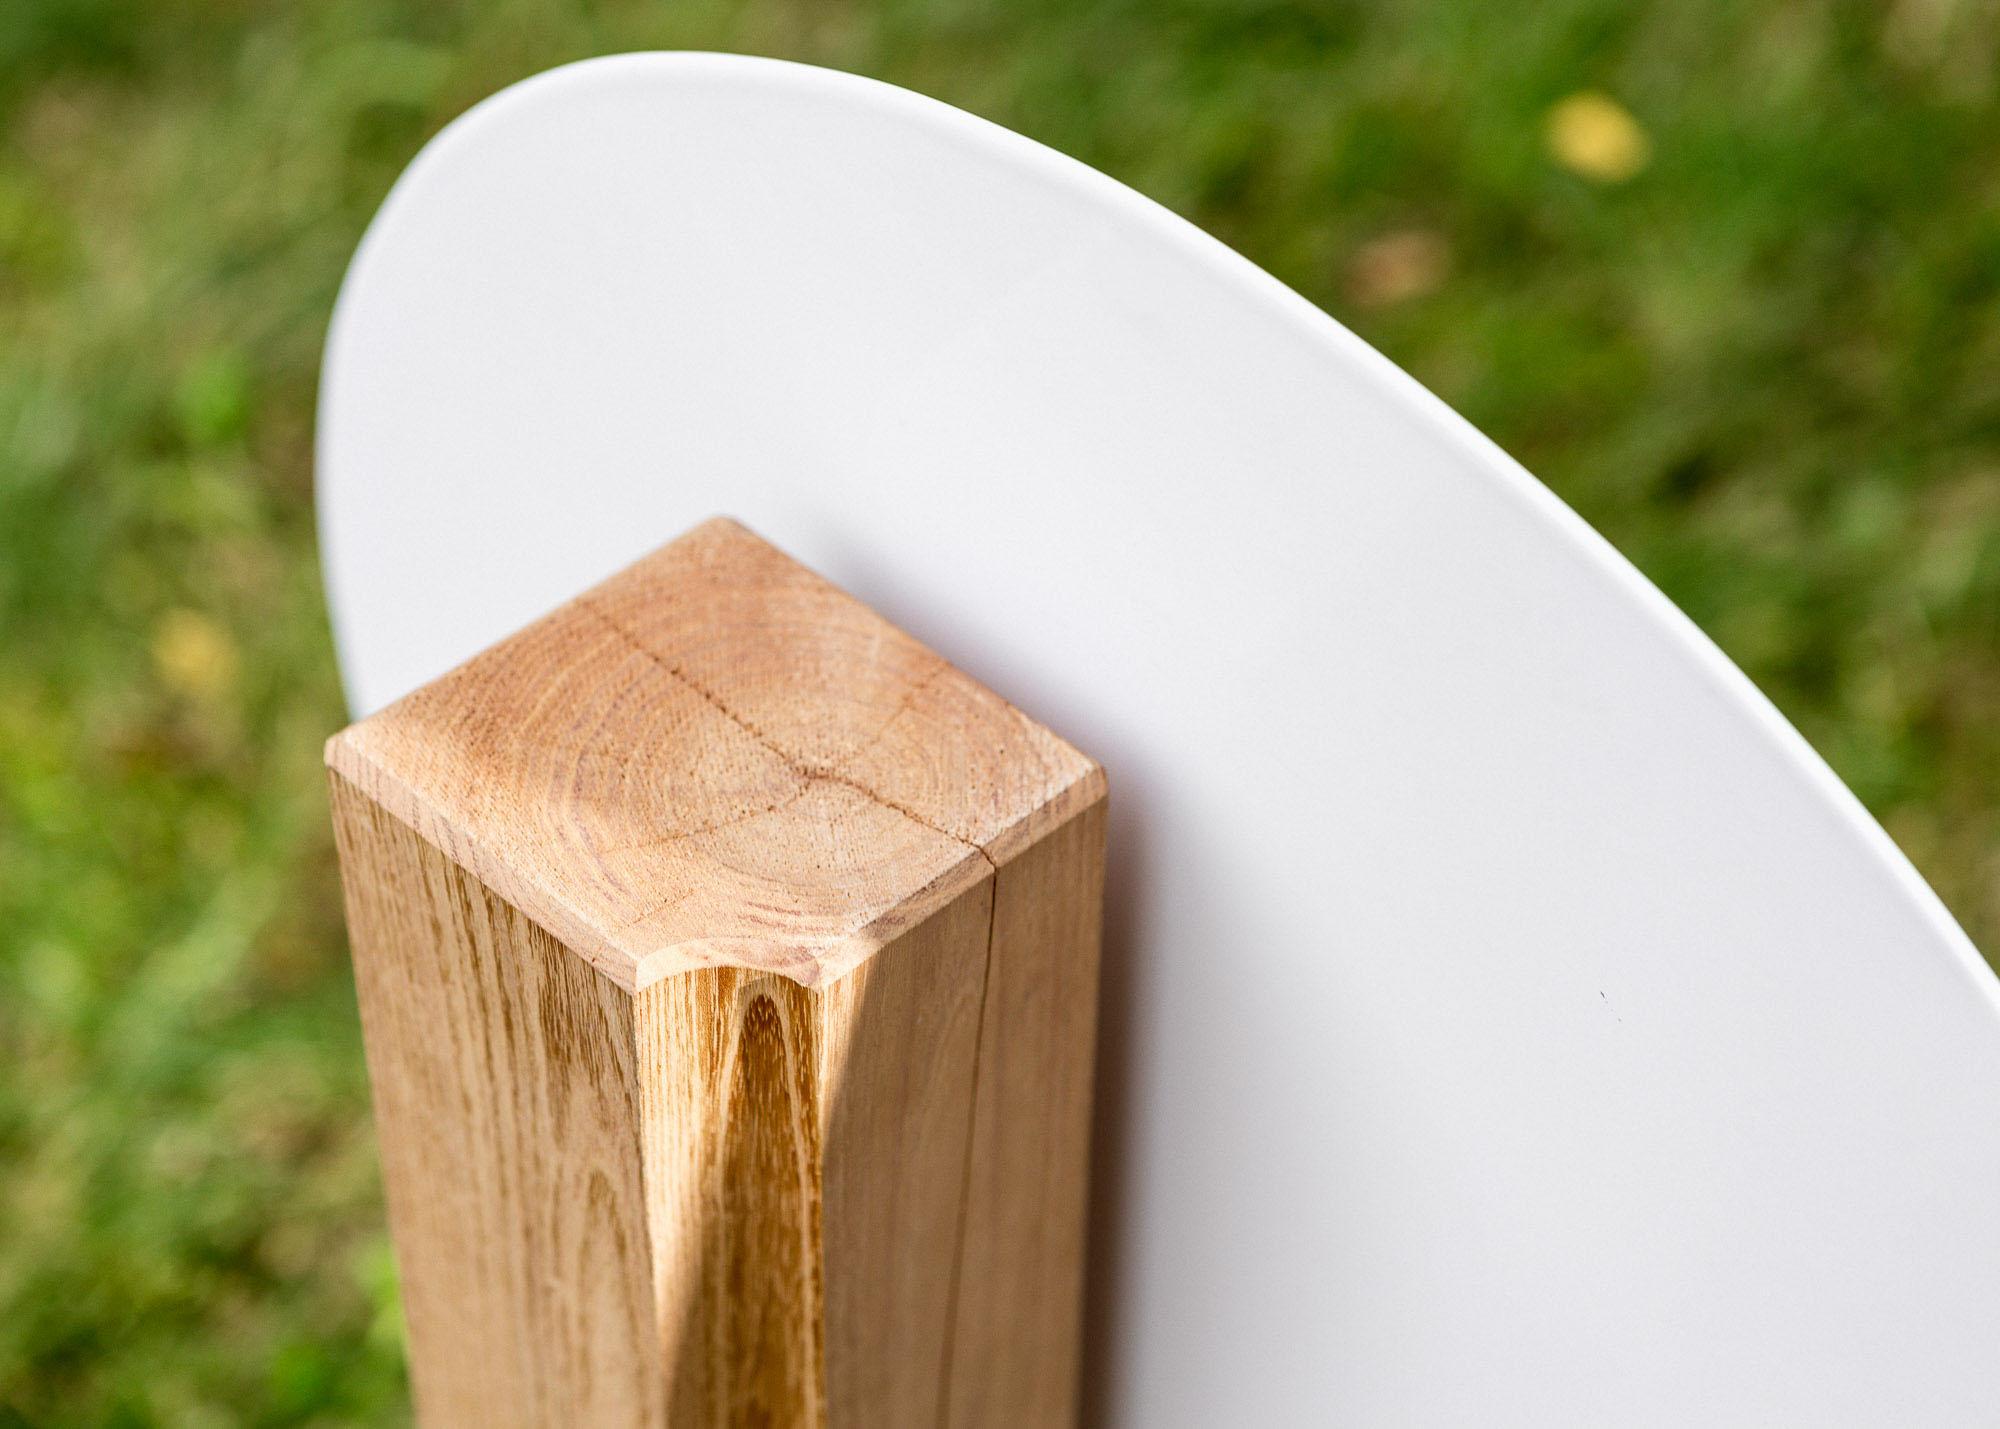 Holz-Grabmal - profilierte moderne Stele mit runder Emaille als Einzelgrabmal oder Familiengrabmal